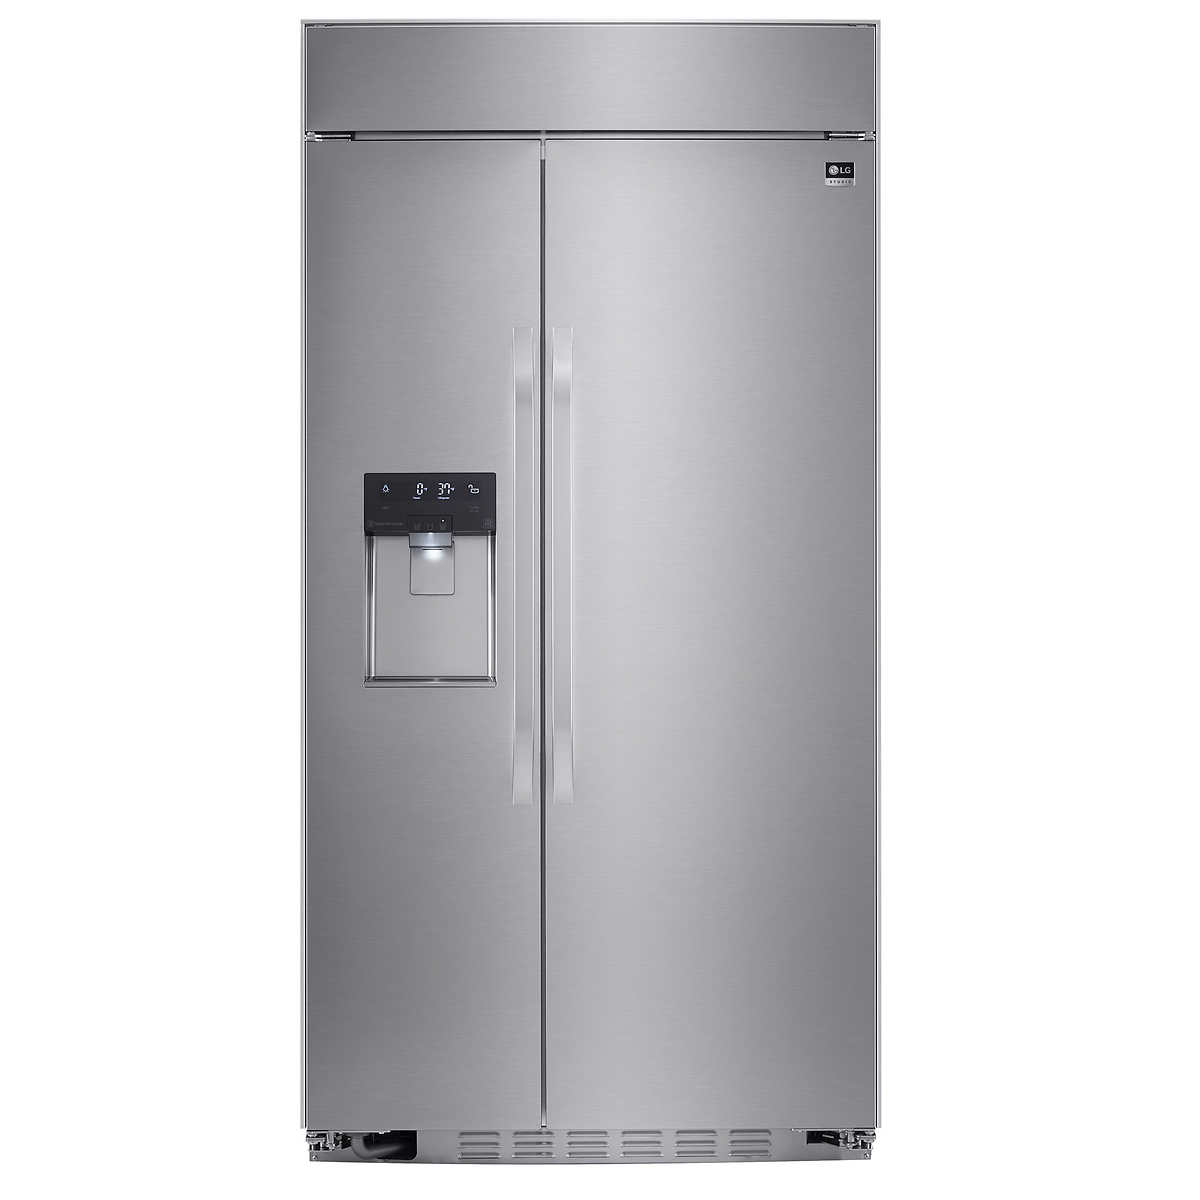 Ge 30 inch side by side white refrigerator - Lg Studio 42 Built In 25 6cuft Side By Side Refrigerator In